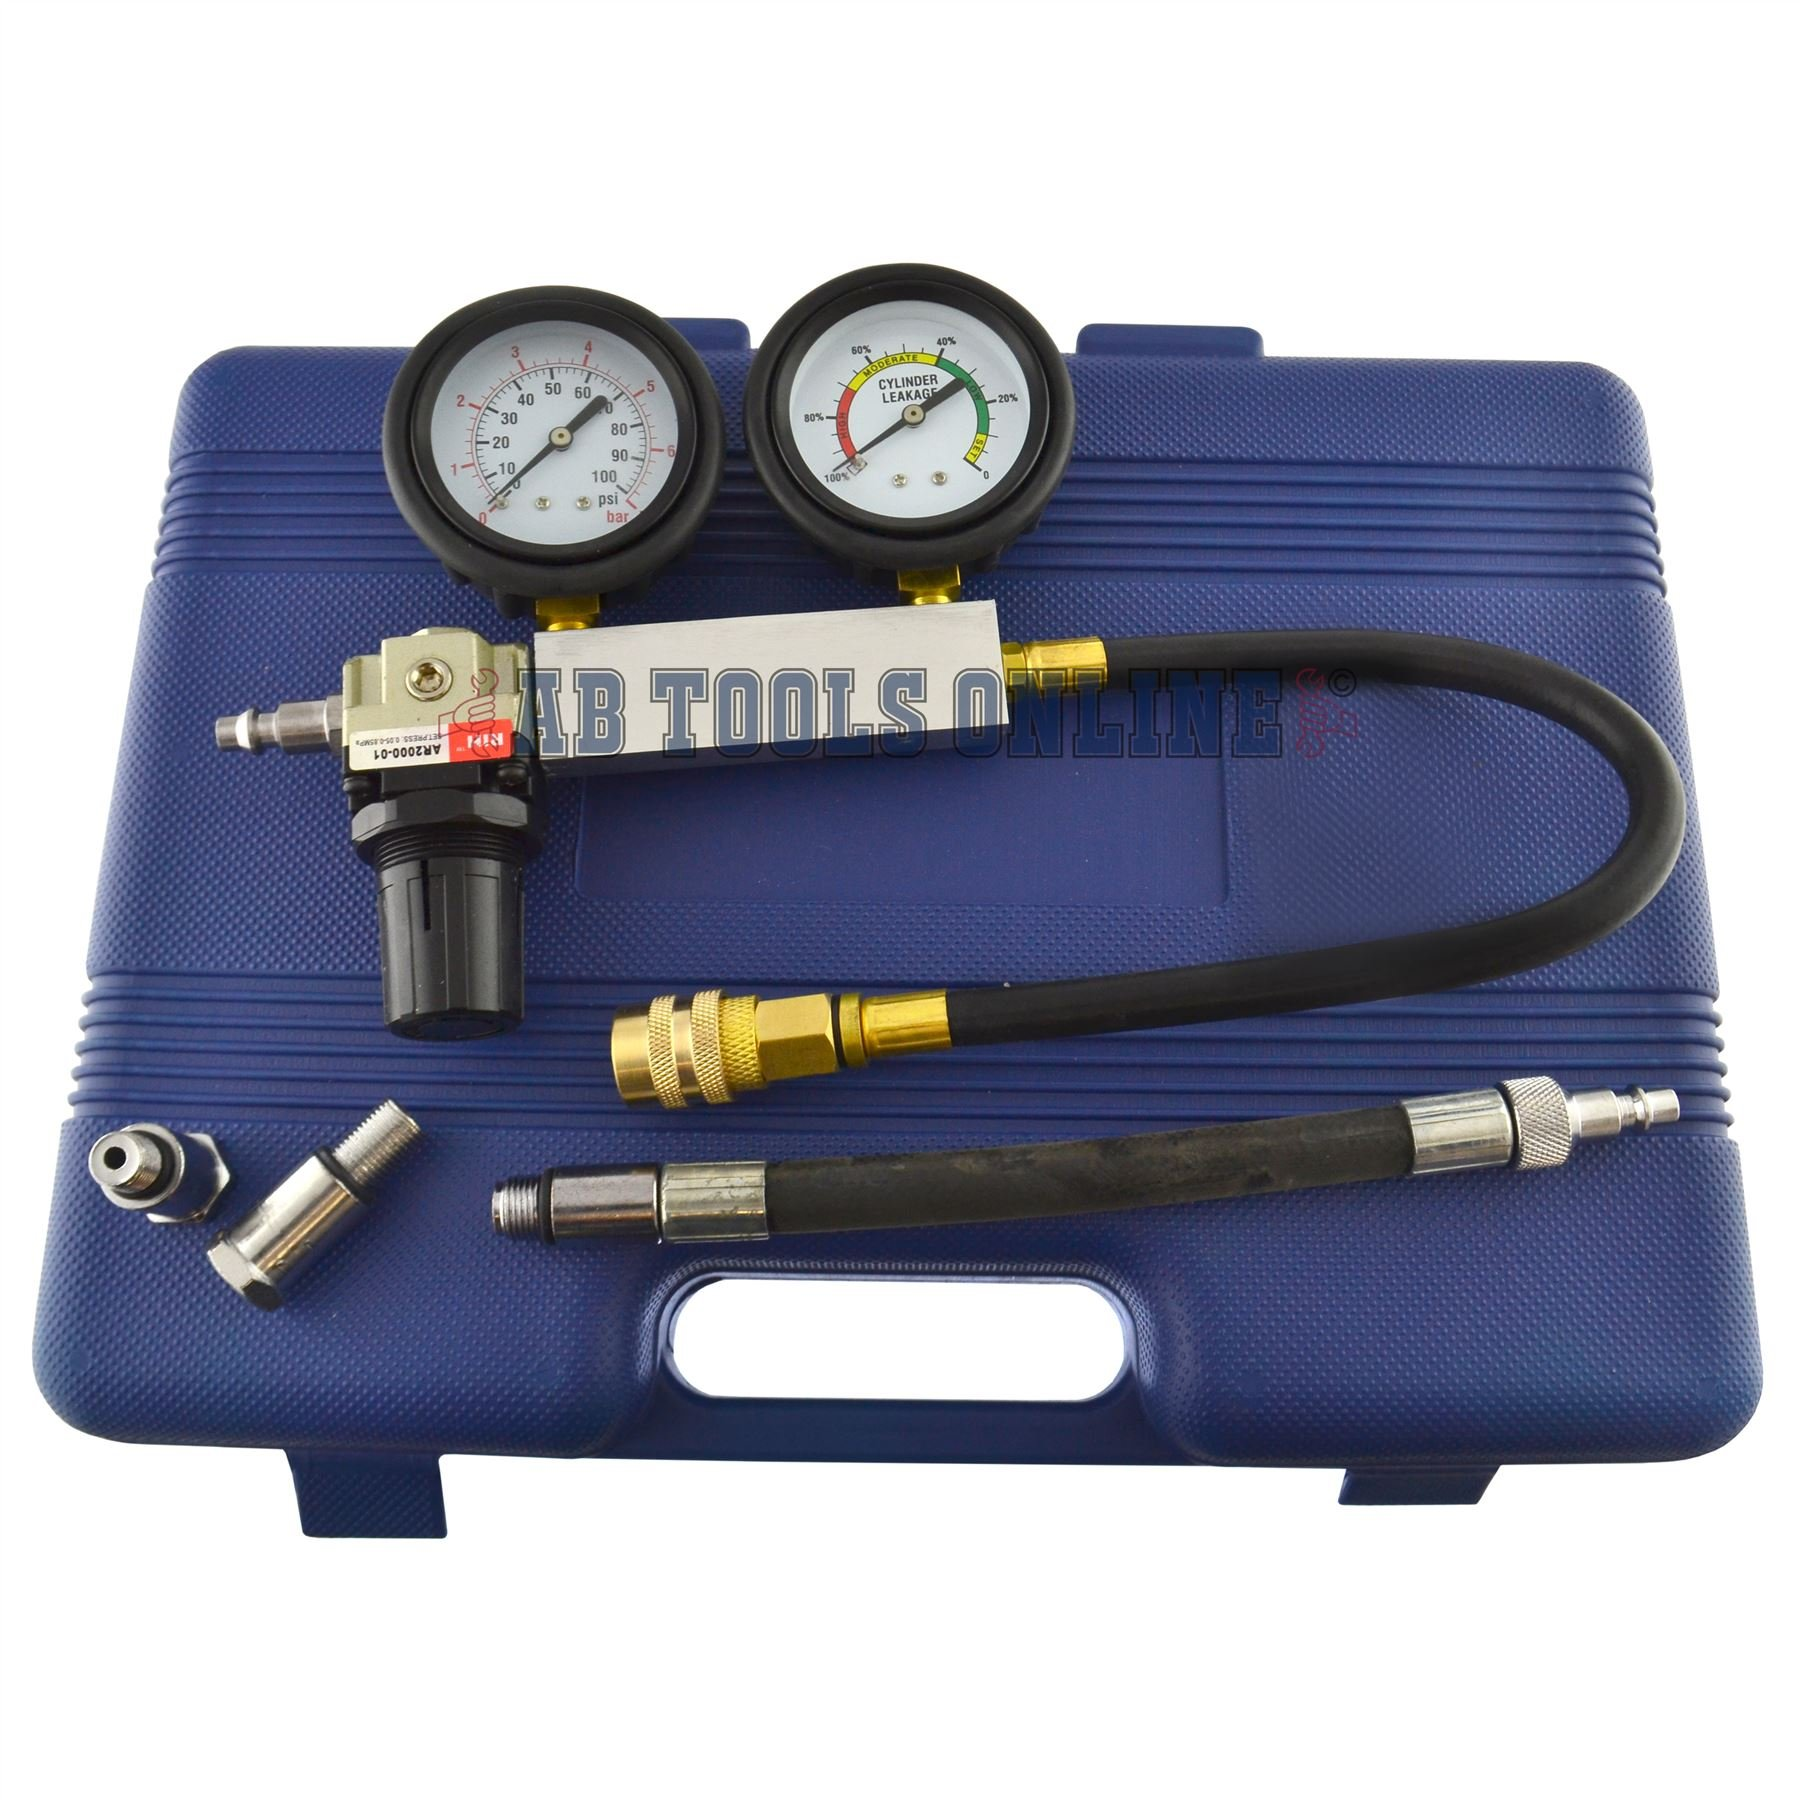 AB Tools-US Pro Cylinder Leak Detector/Tester Compression Leakage kit Set Petrol Engines AT270 by AB Tools-US Pro (Image #5)